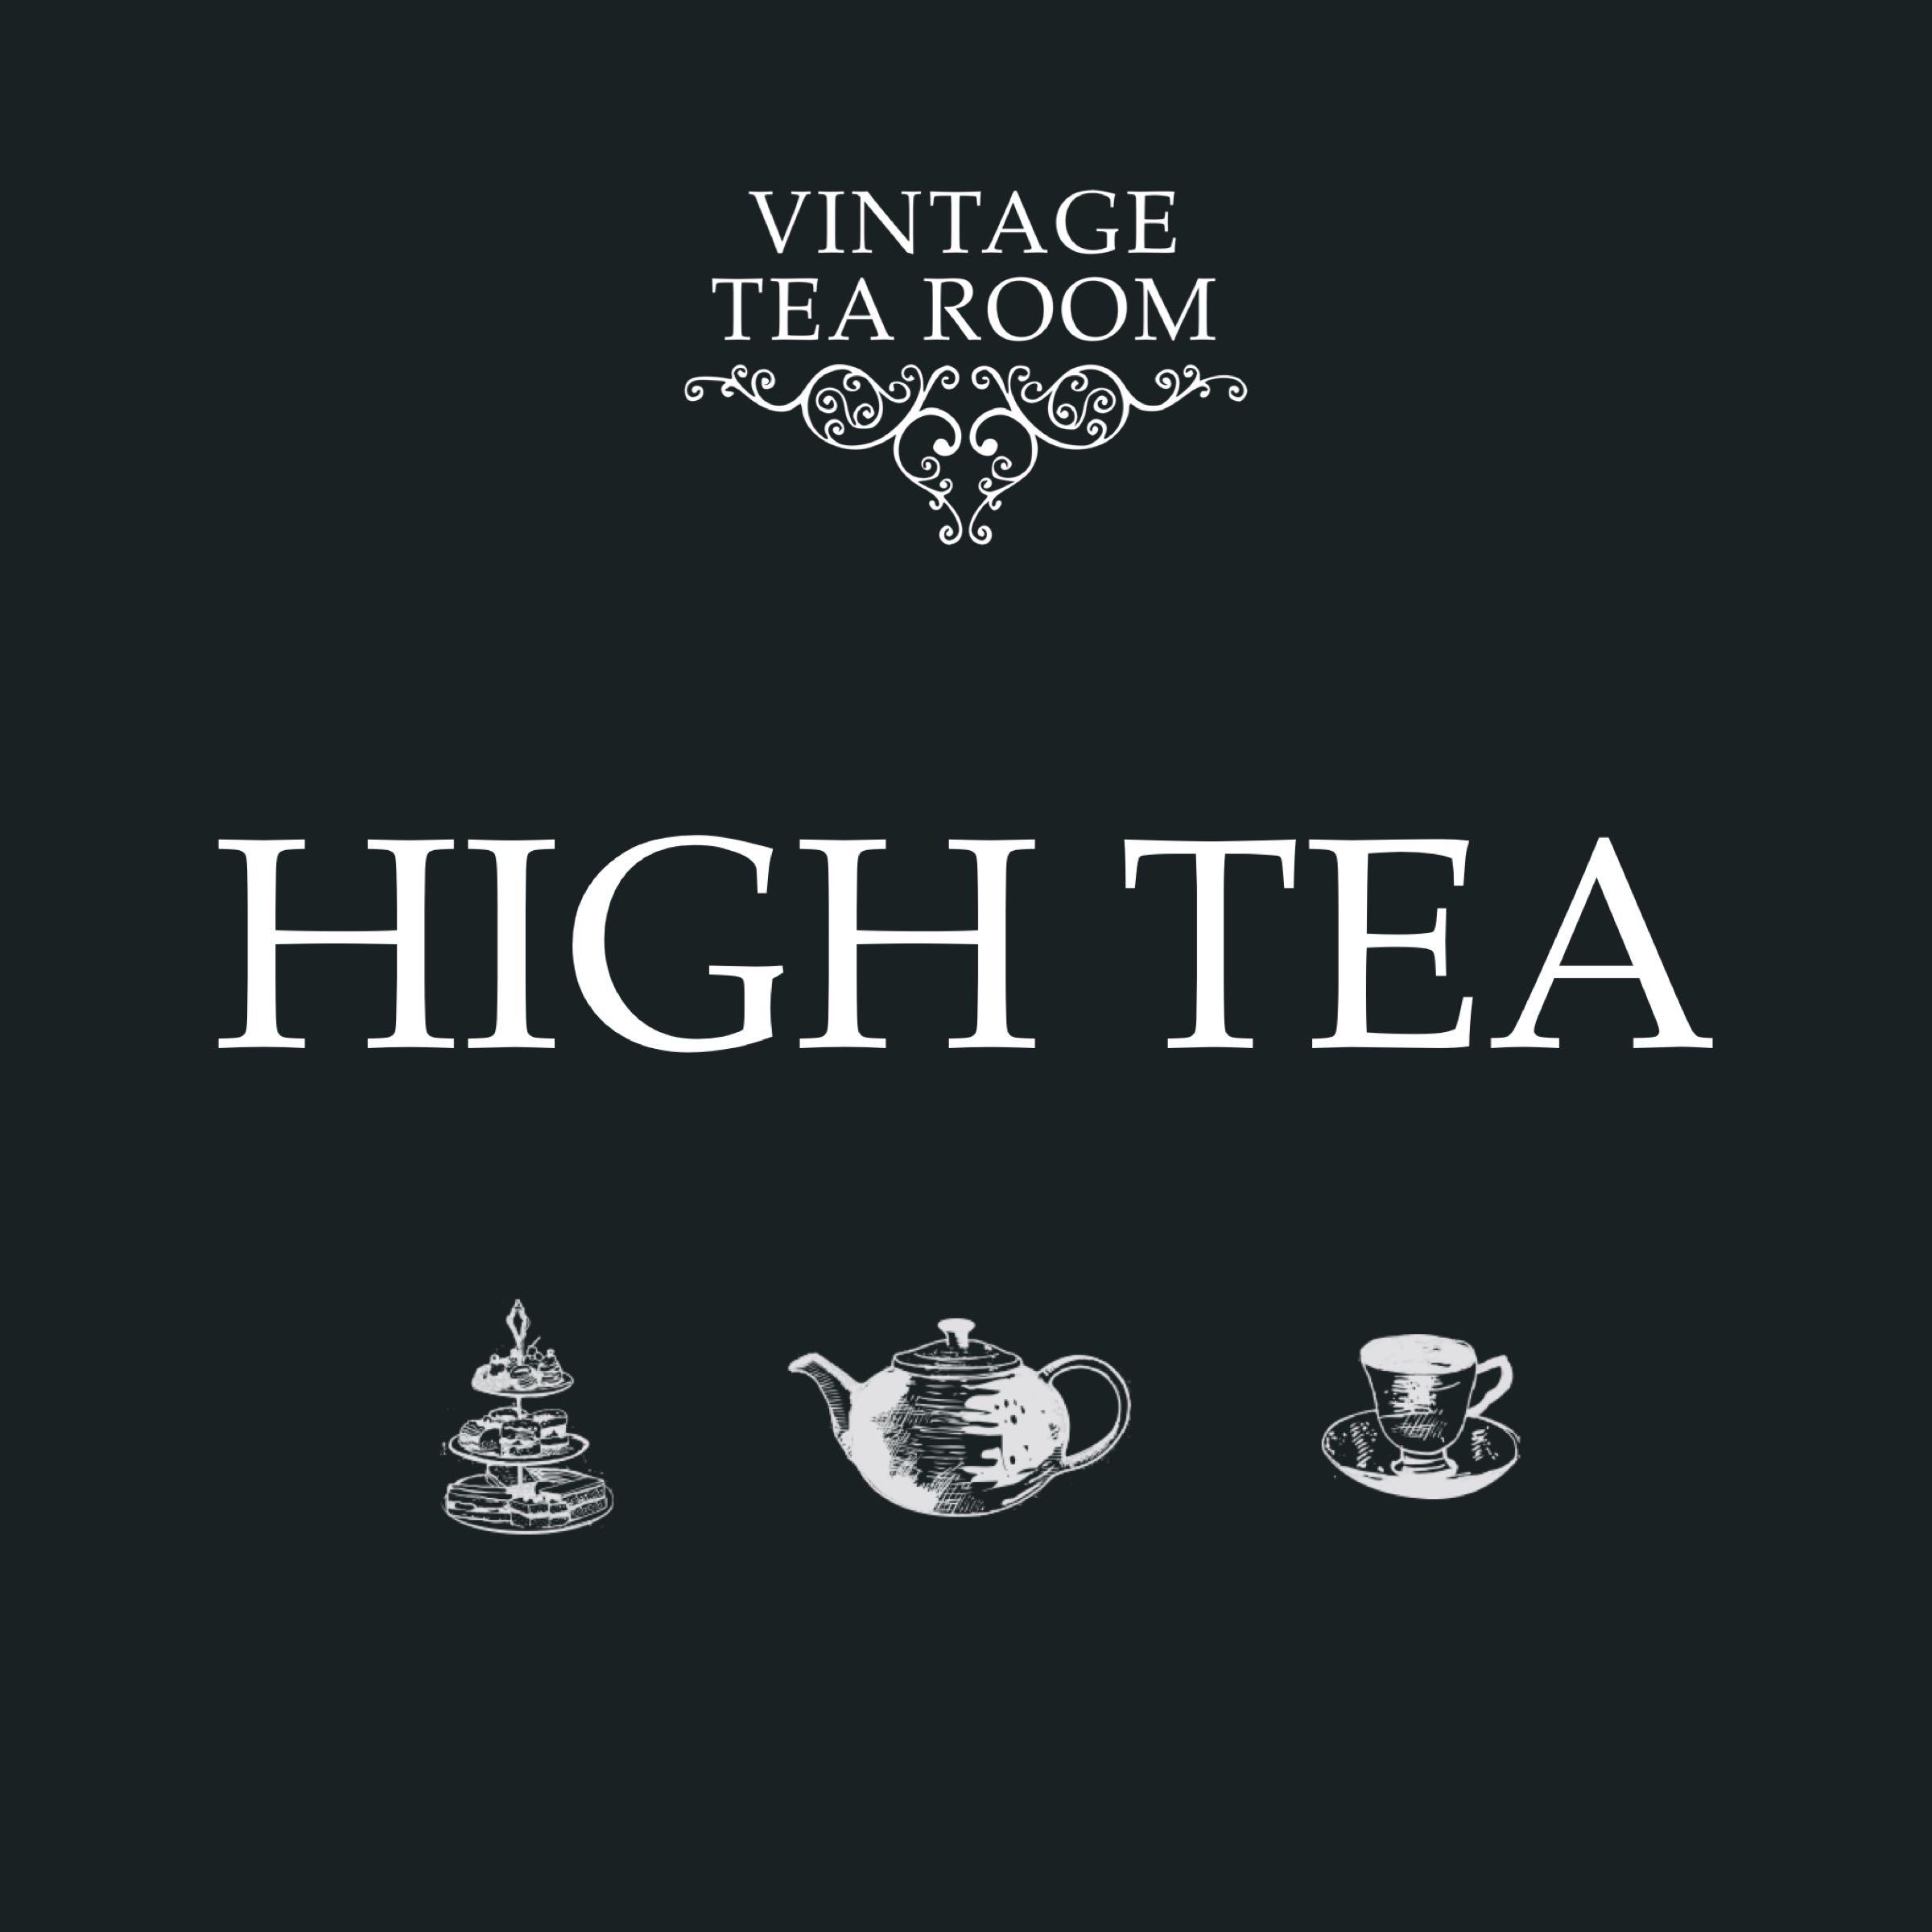 Vintage High Tea For One - Voucher